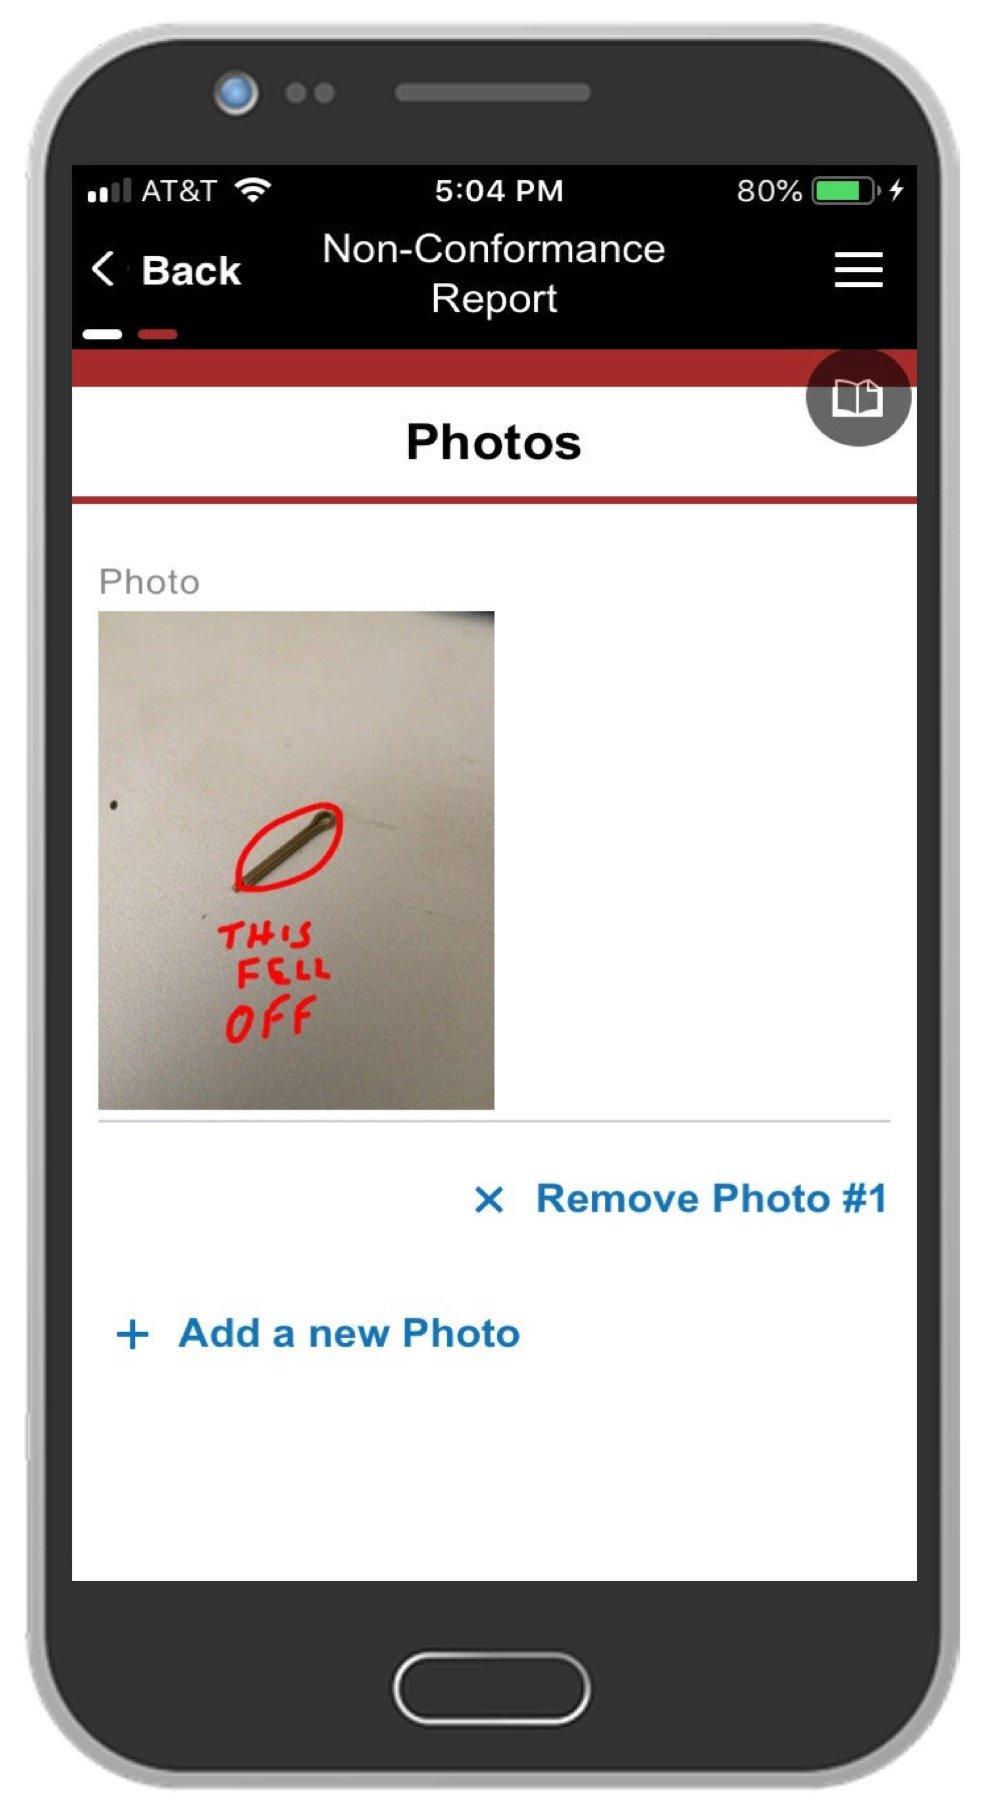 NCR App Screenshot 2